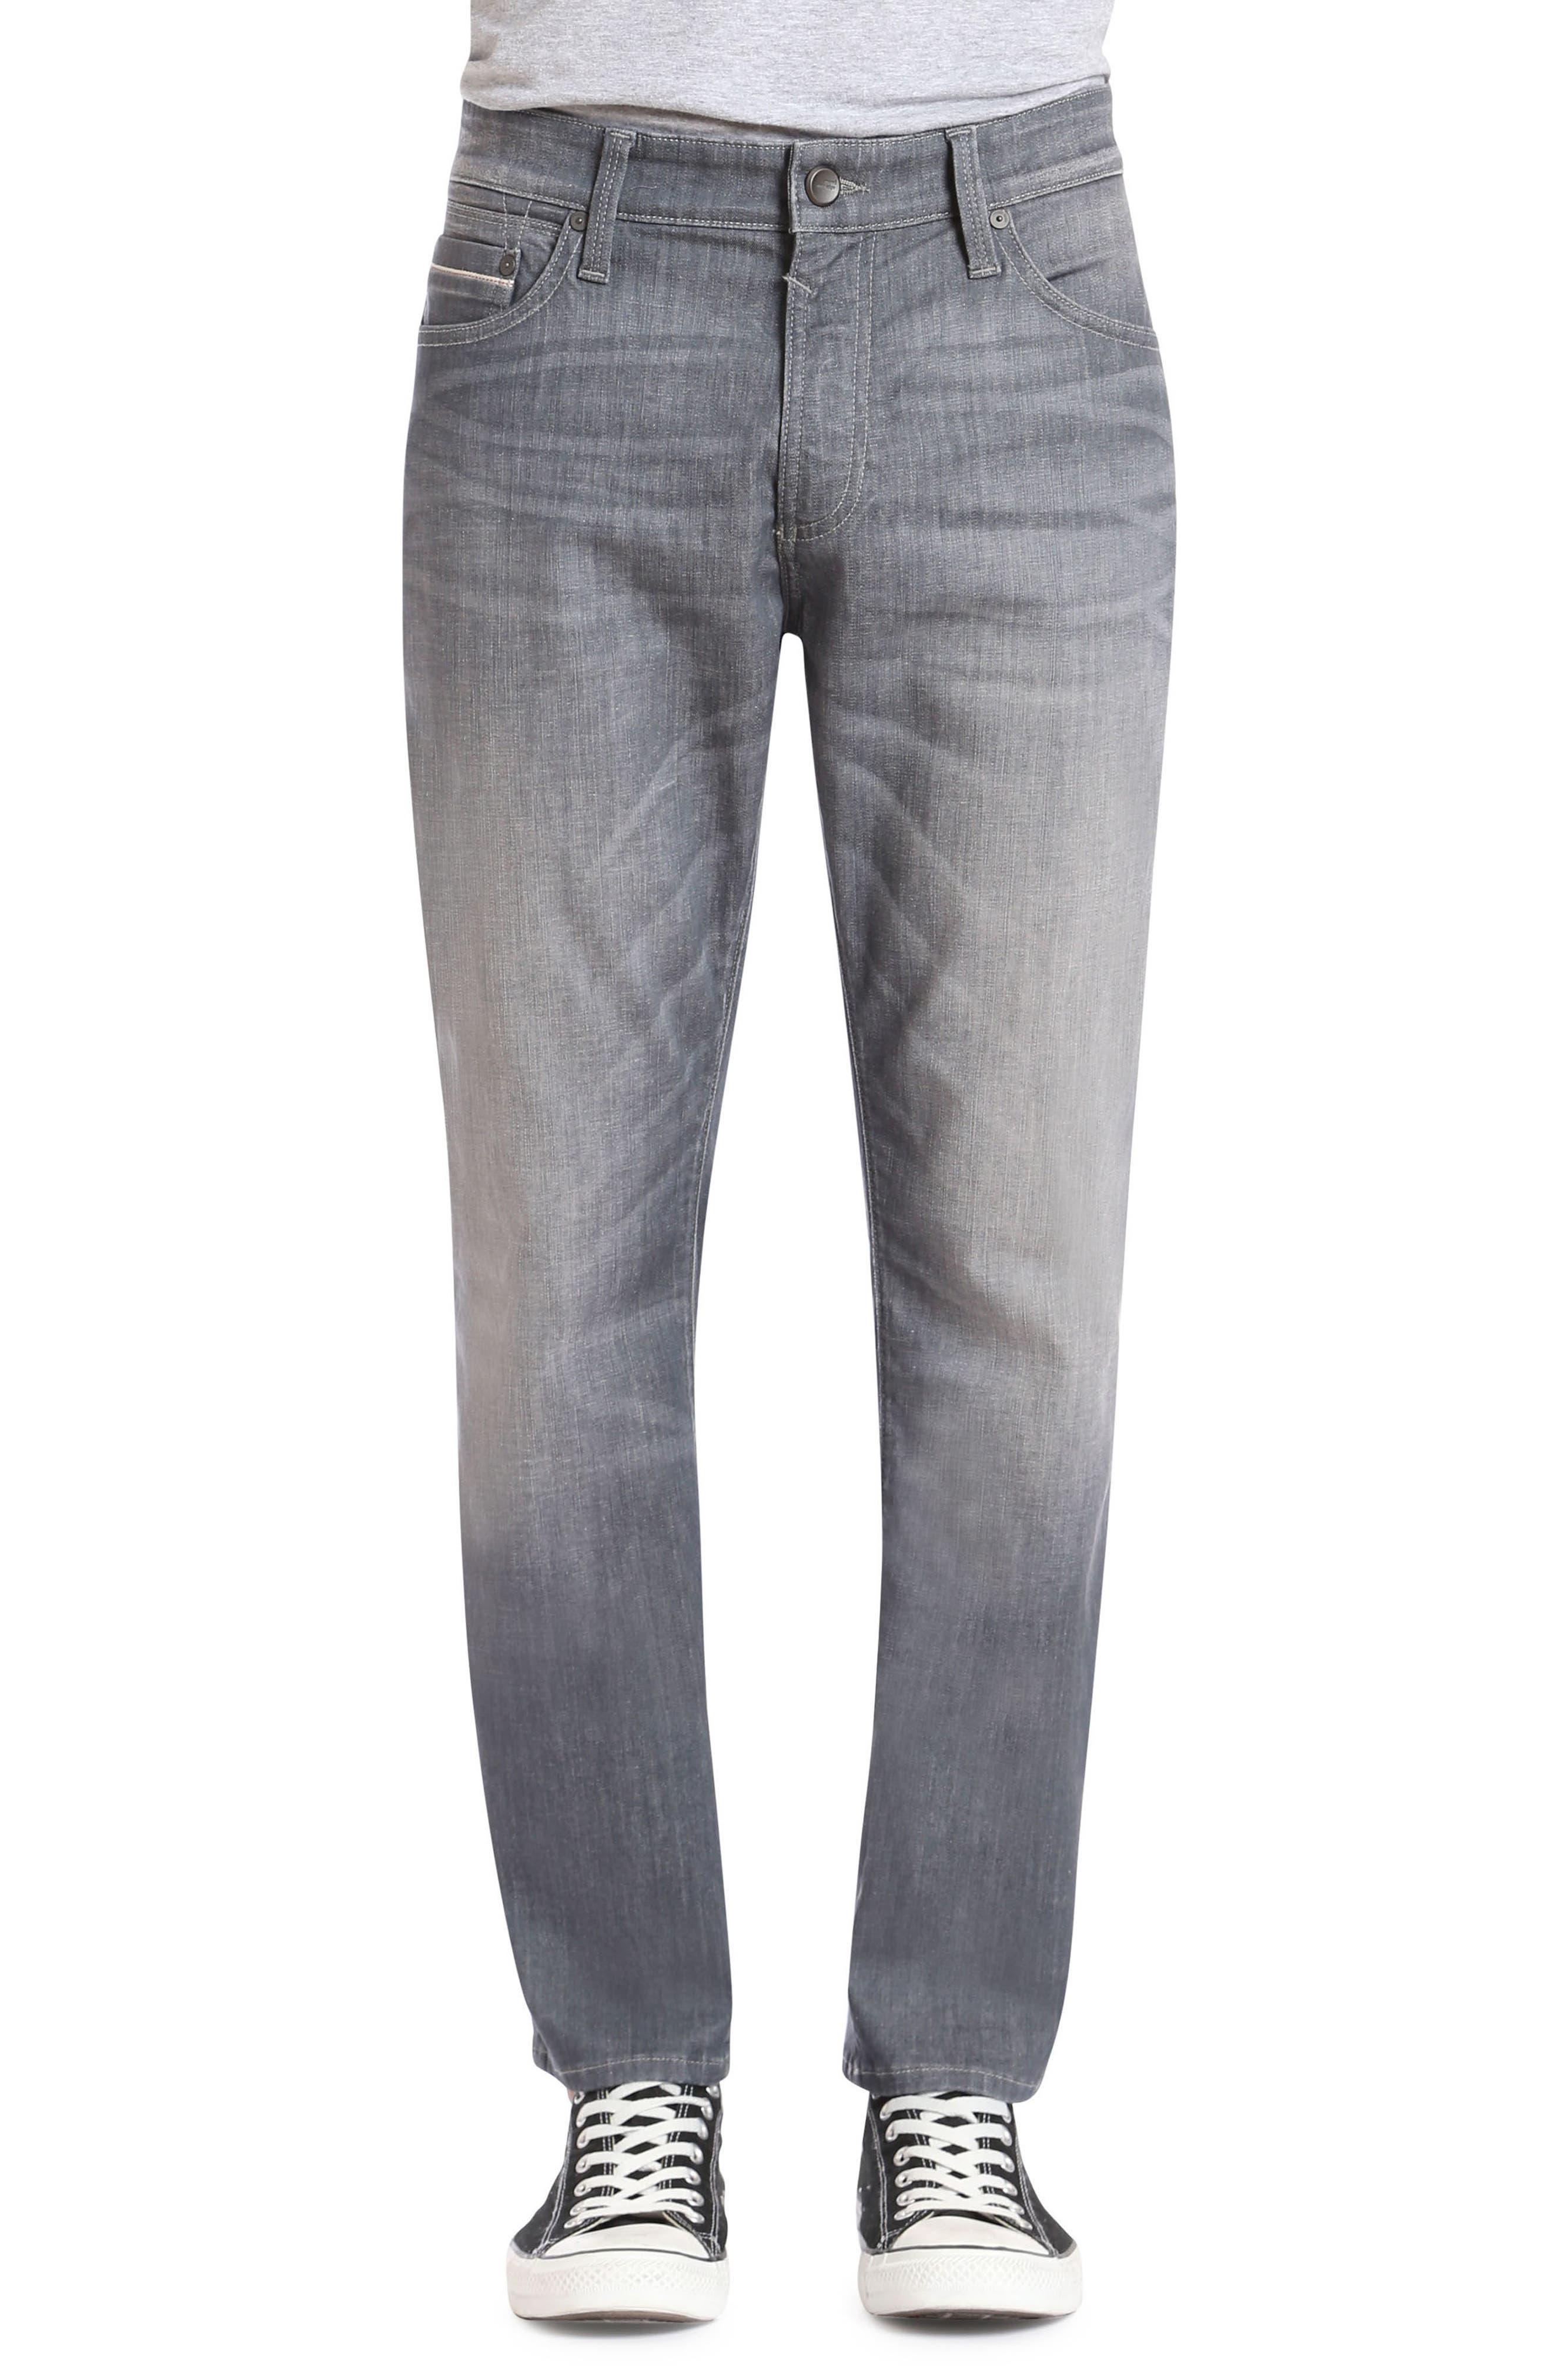 Marcus Slim Straight Leg Jeans,                             Main thumbnail 1, color,